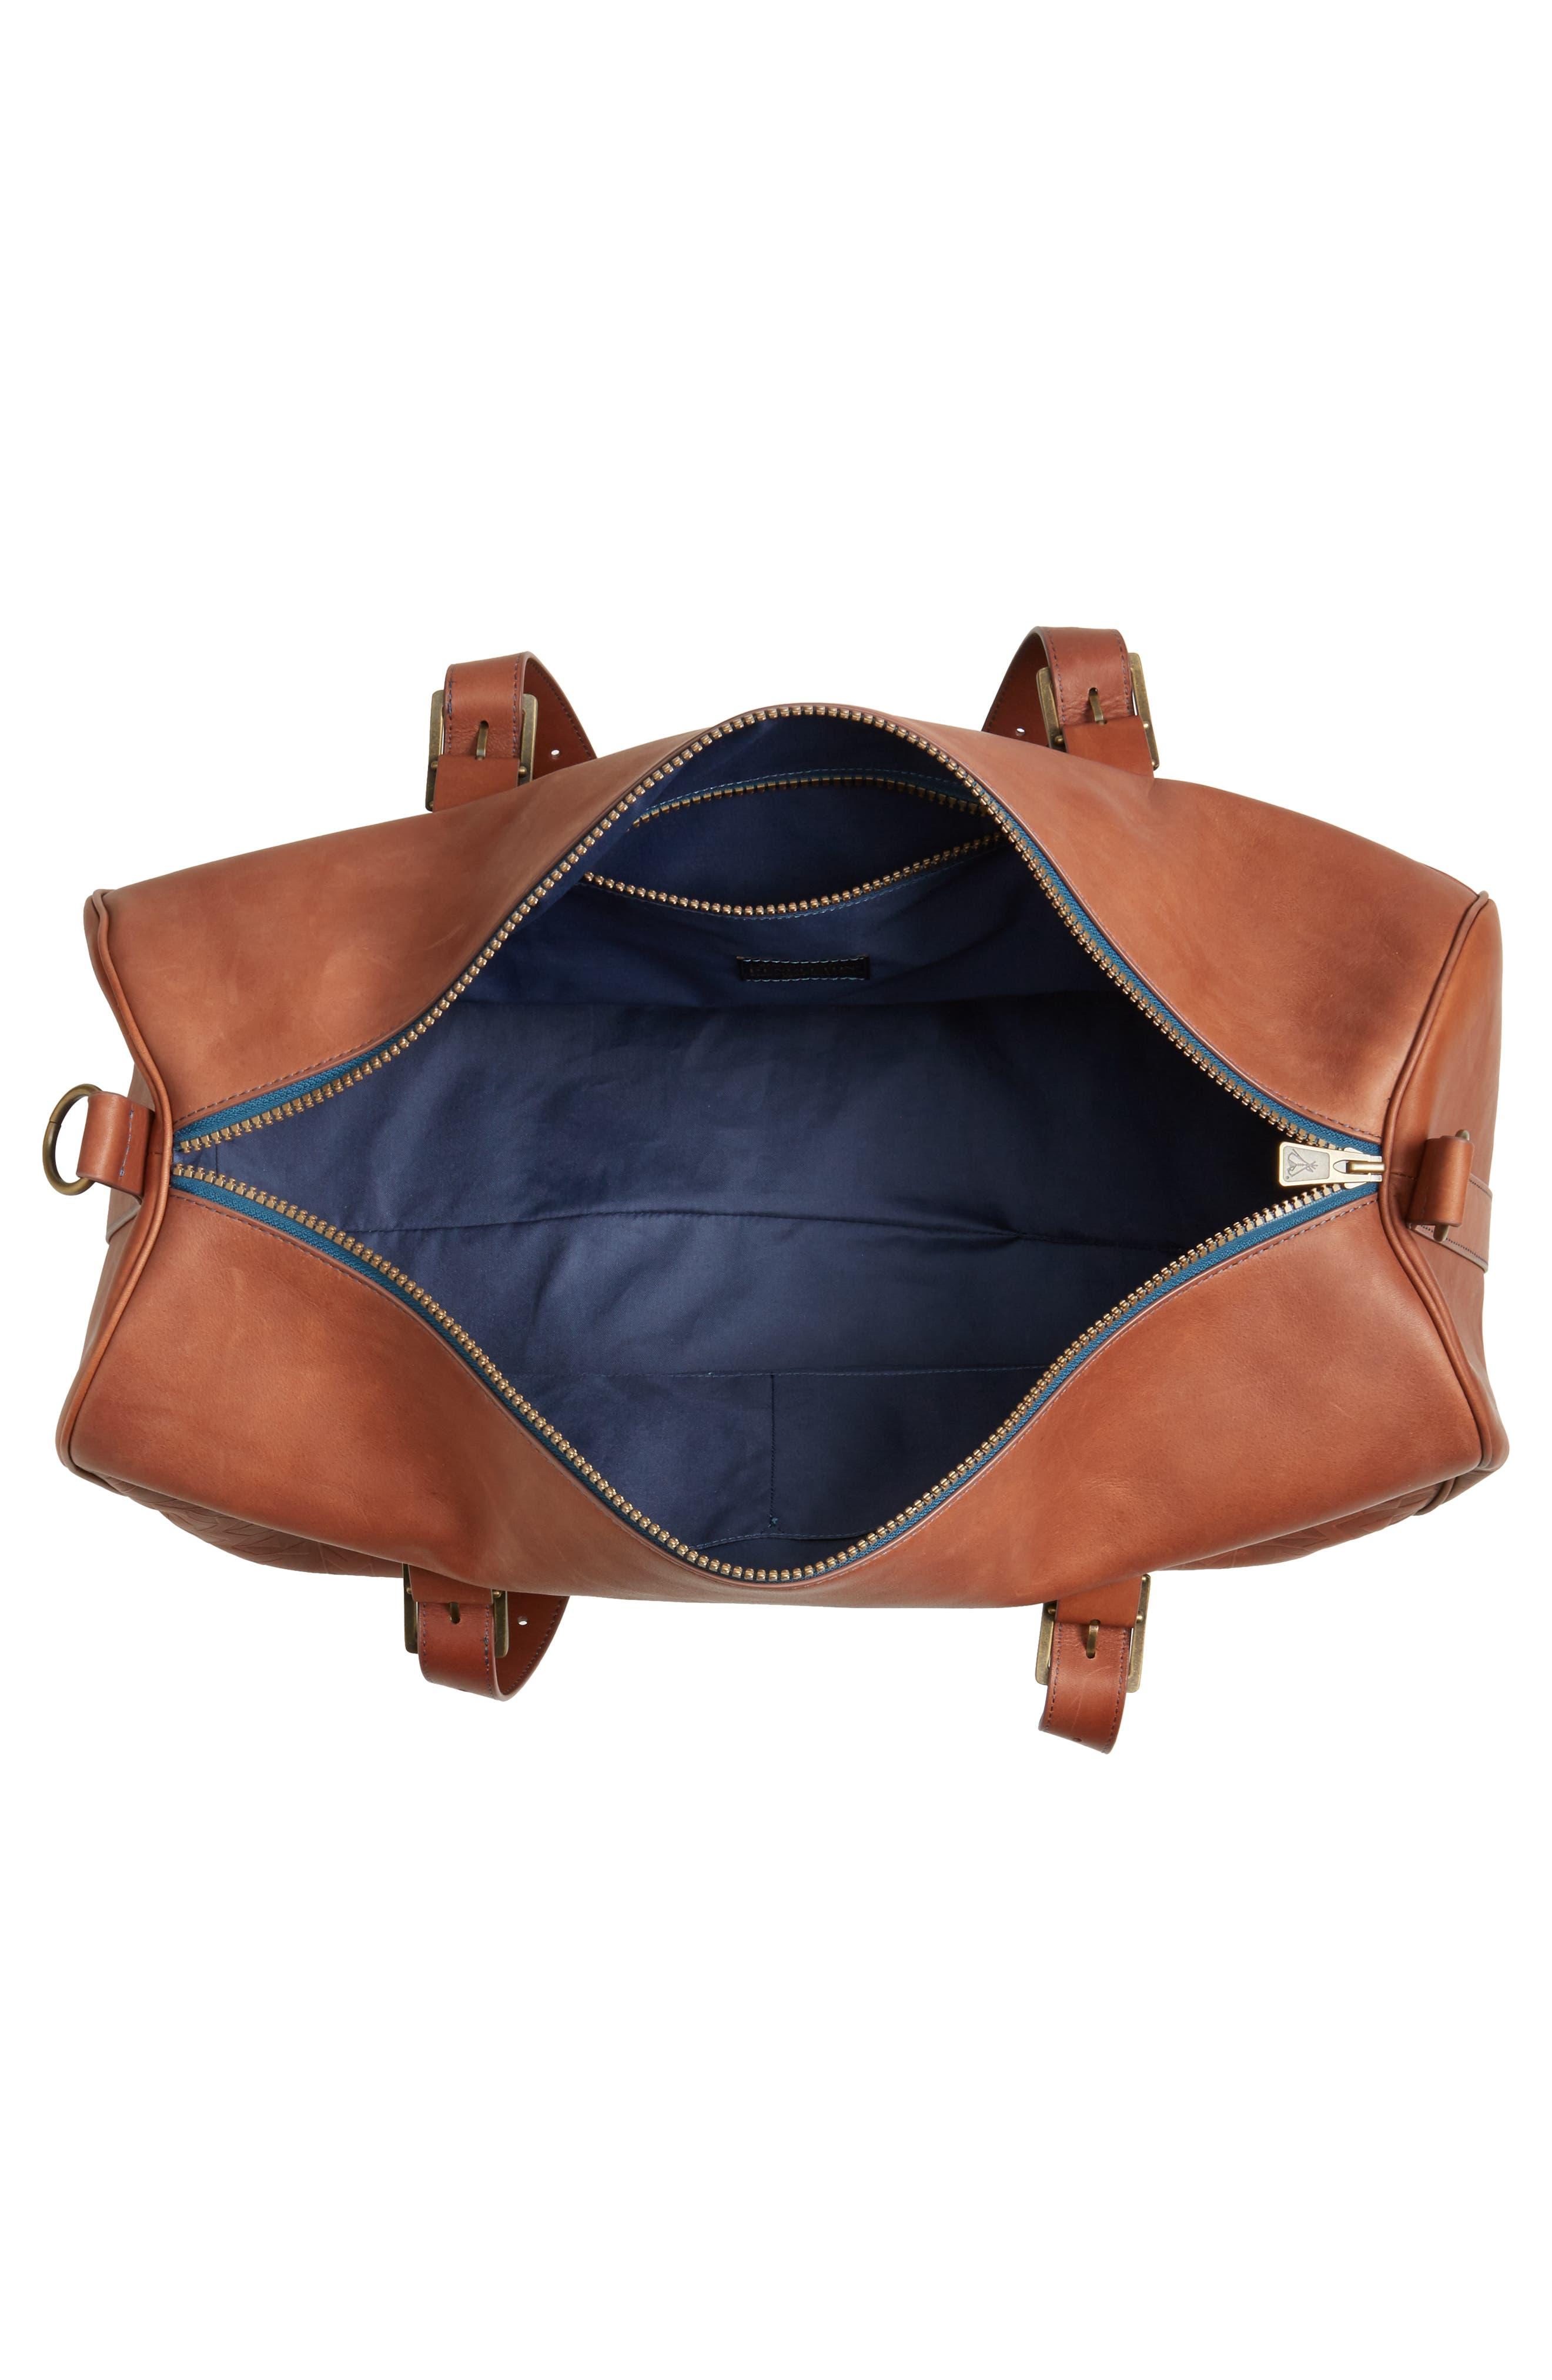 Voyager Duffel Bag,                             Alternate thumbnail 4, color,                             200